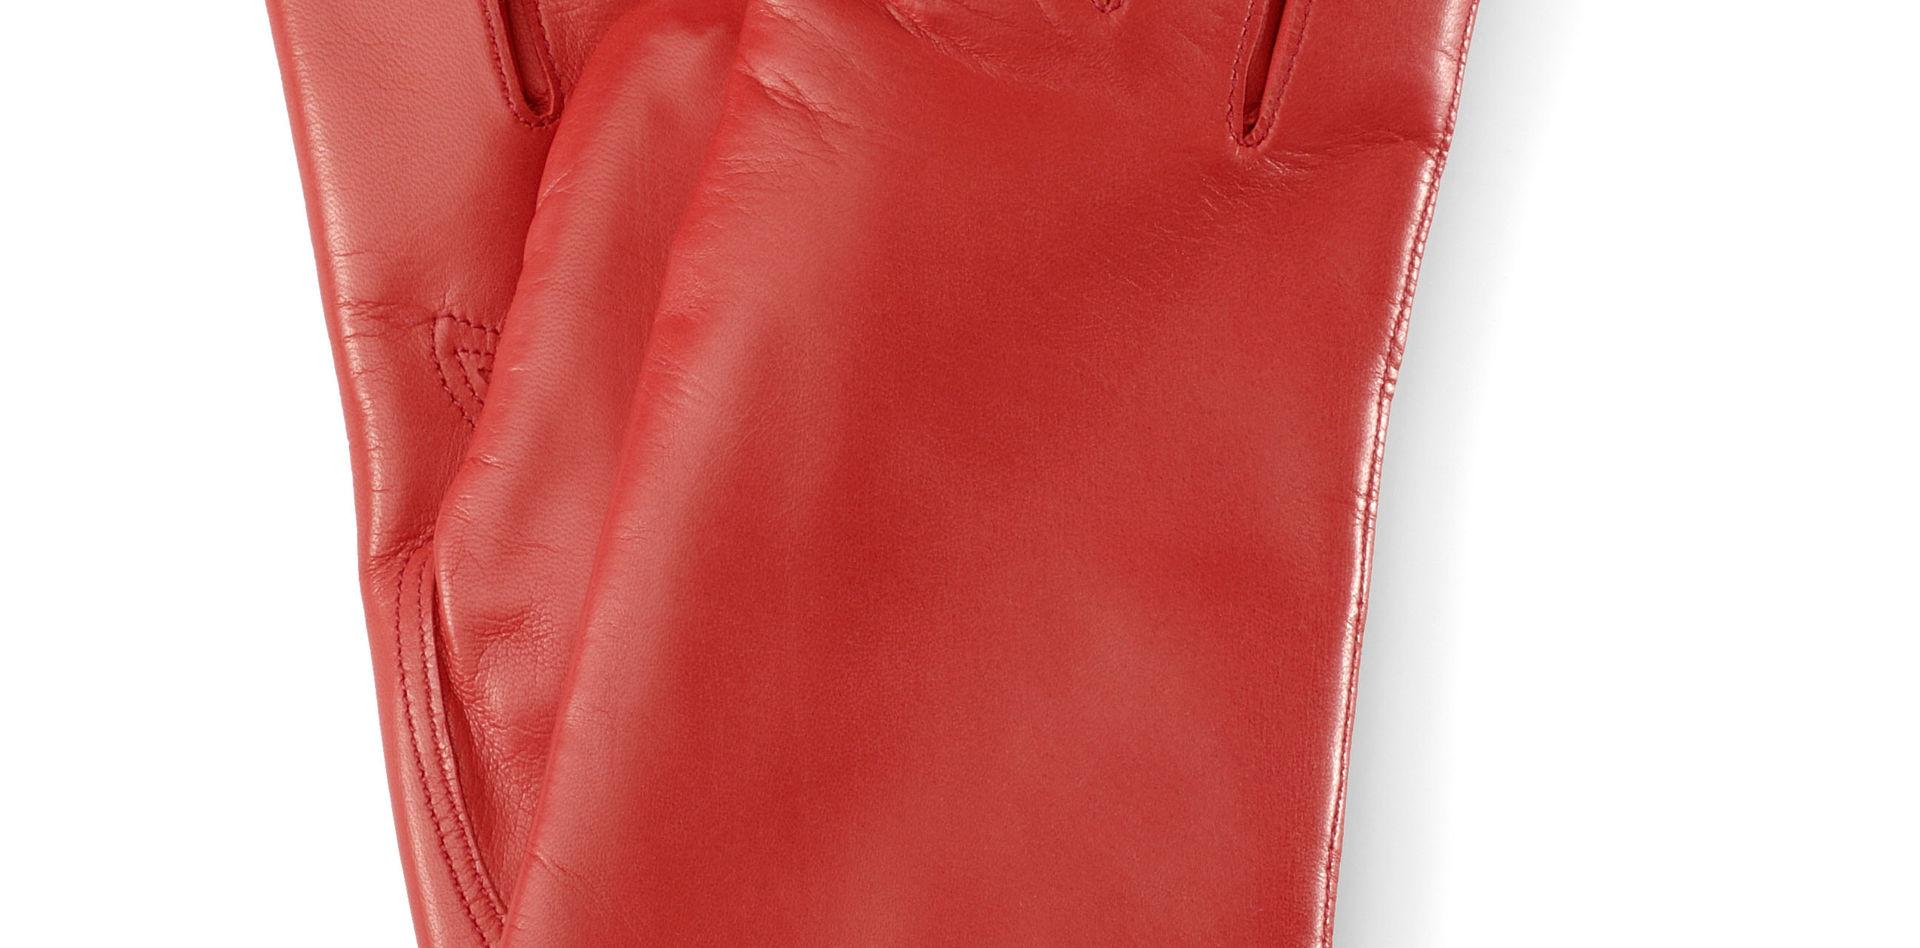 Red Gloves